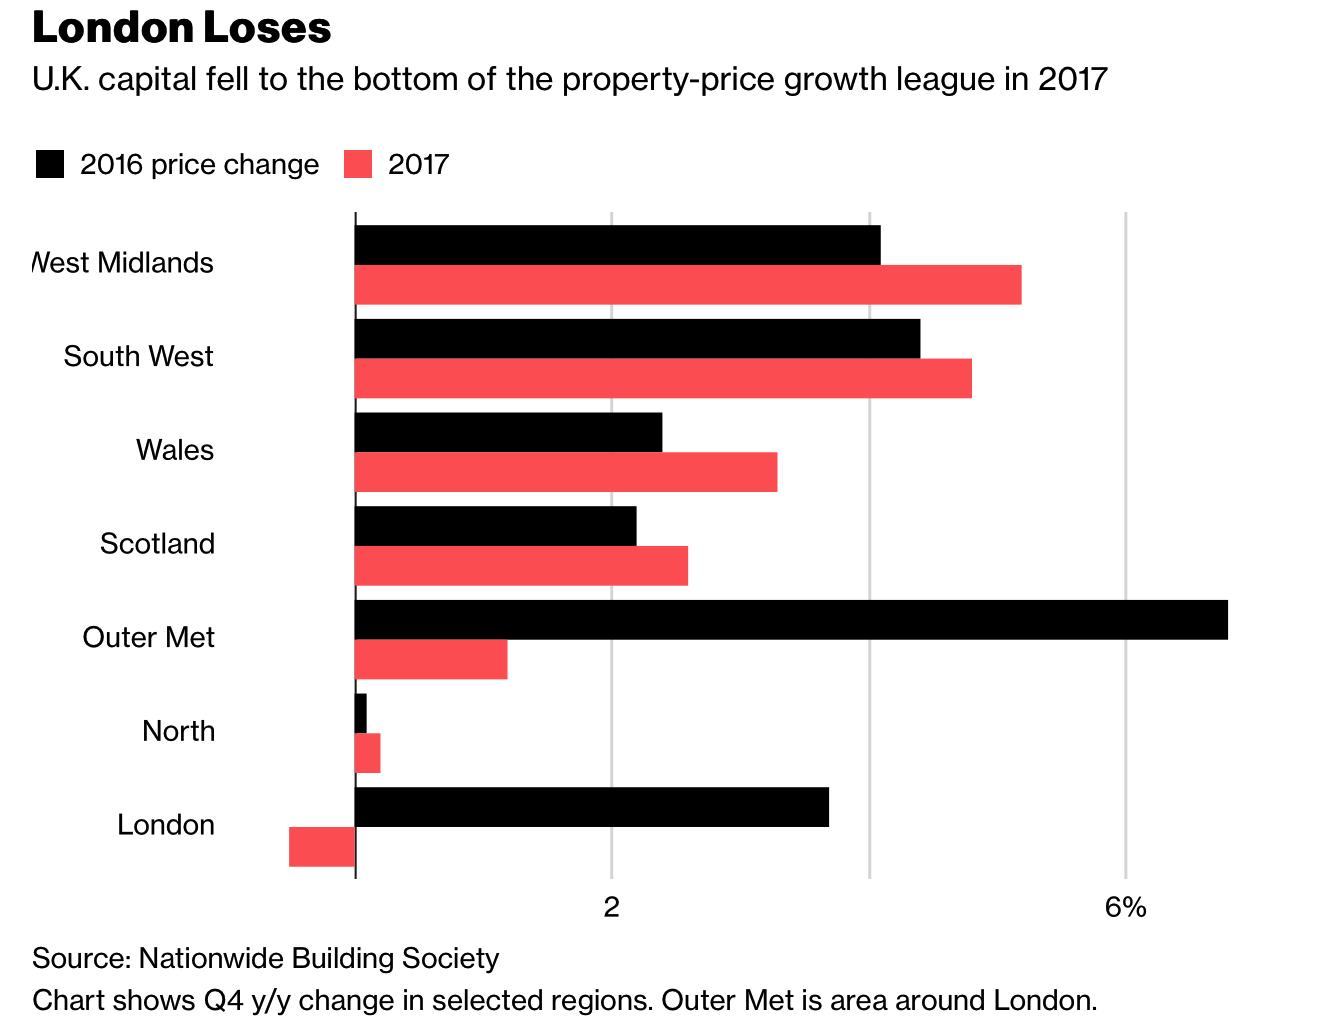 U.K. Property Price Change Q4 2017